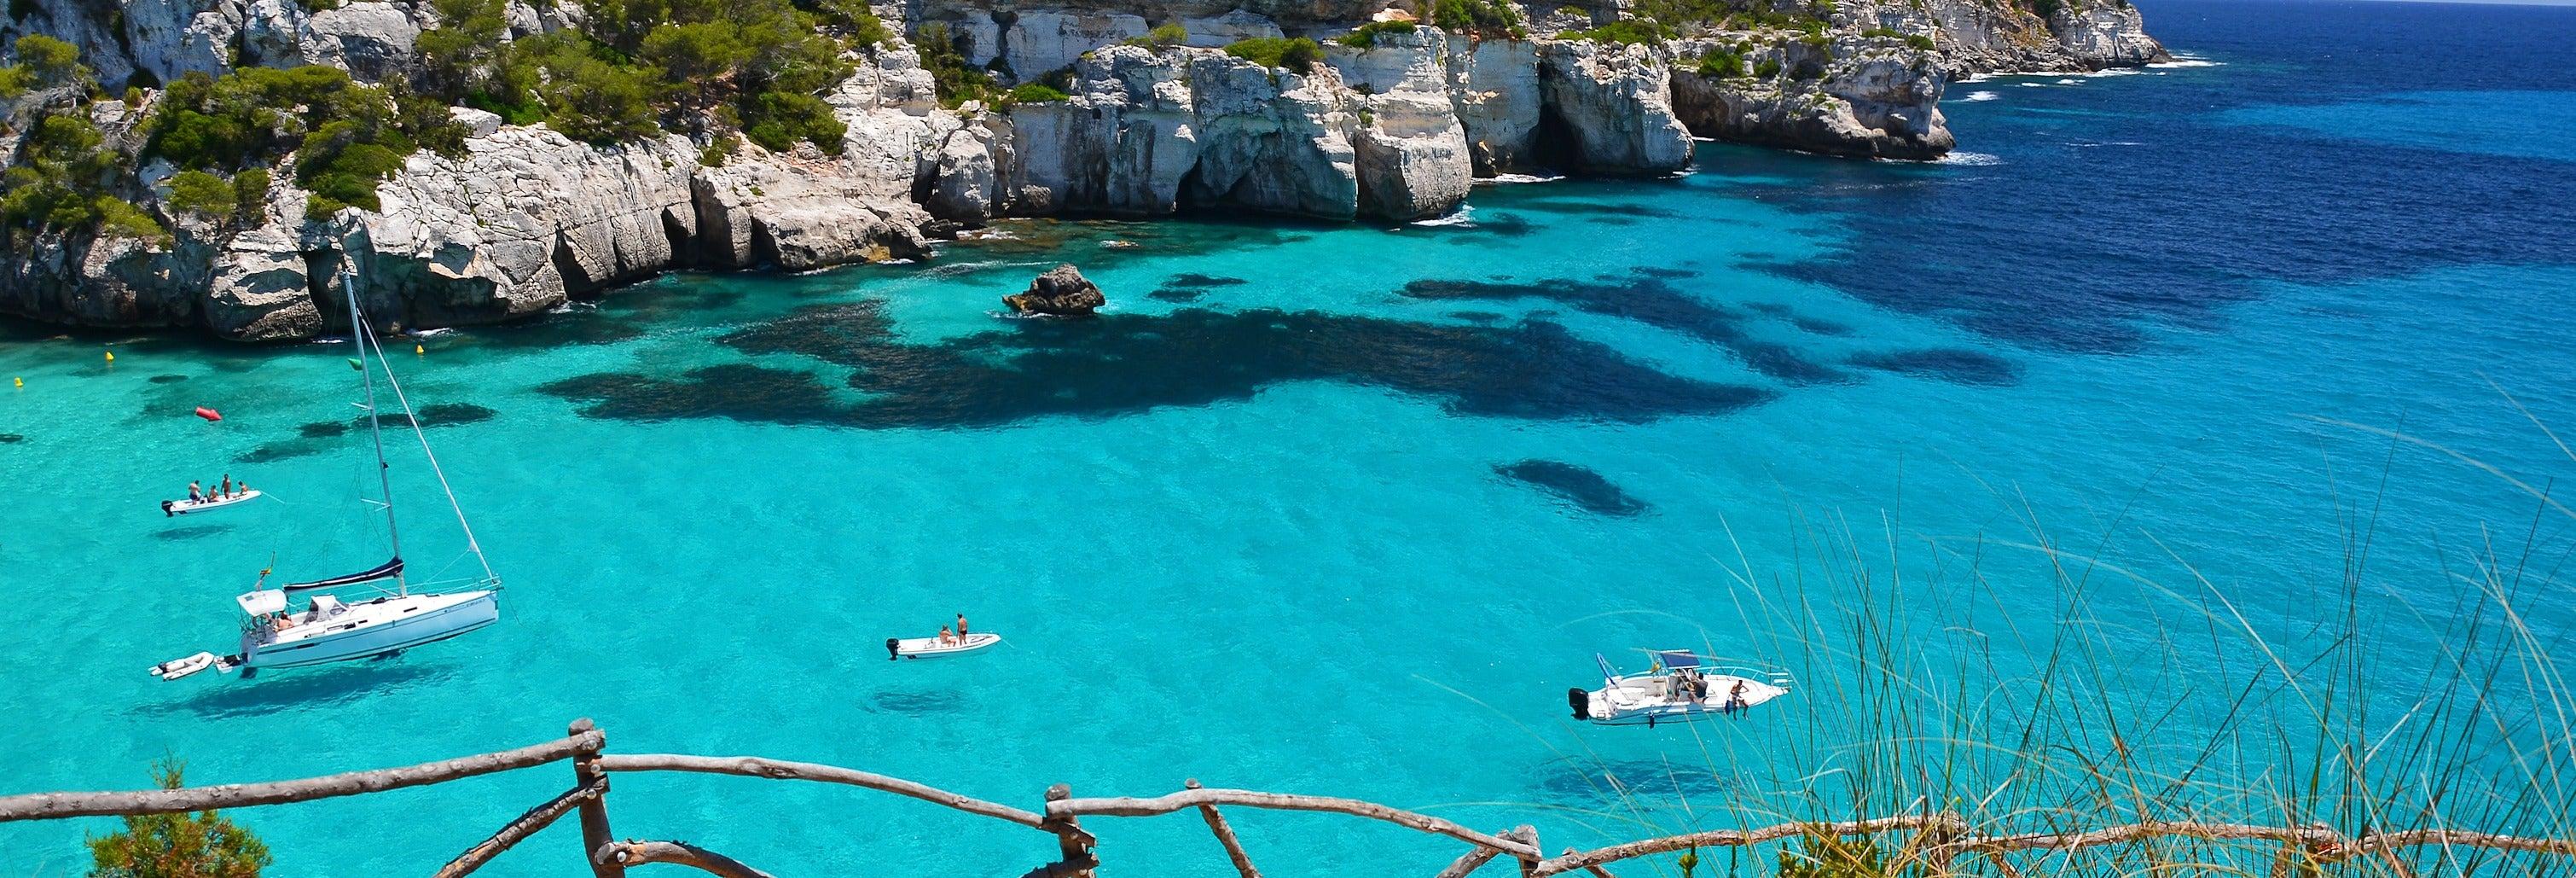 Menorca Day Trip